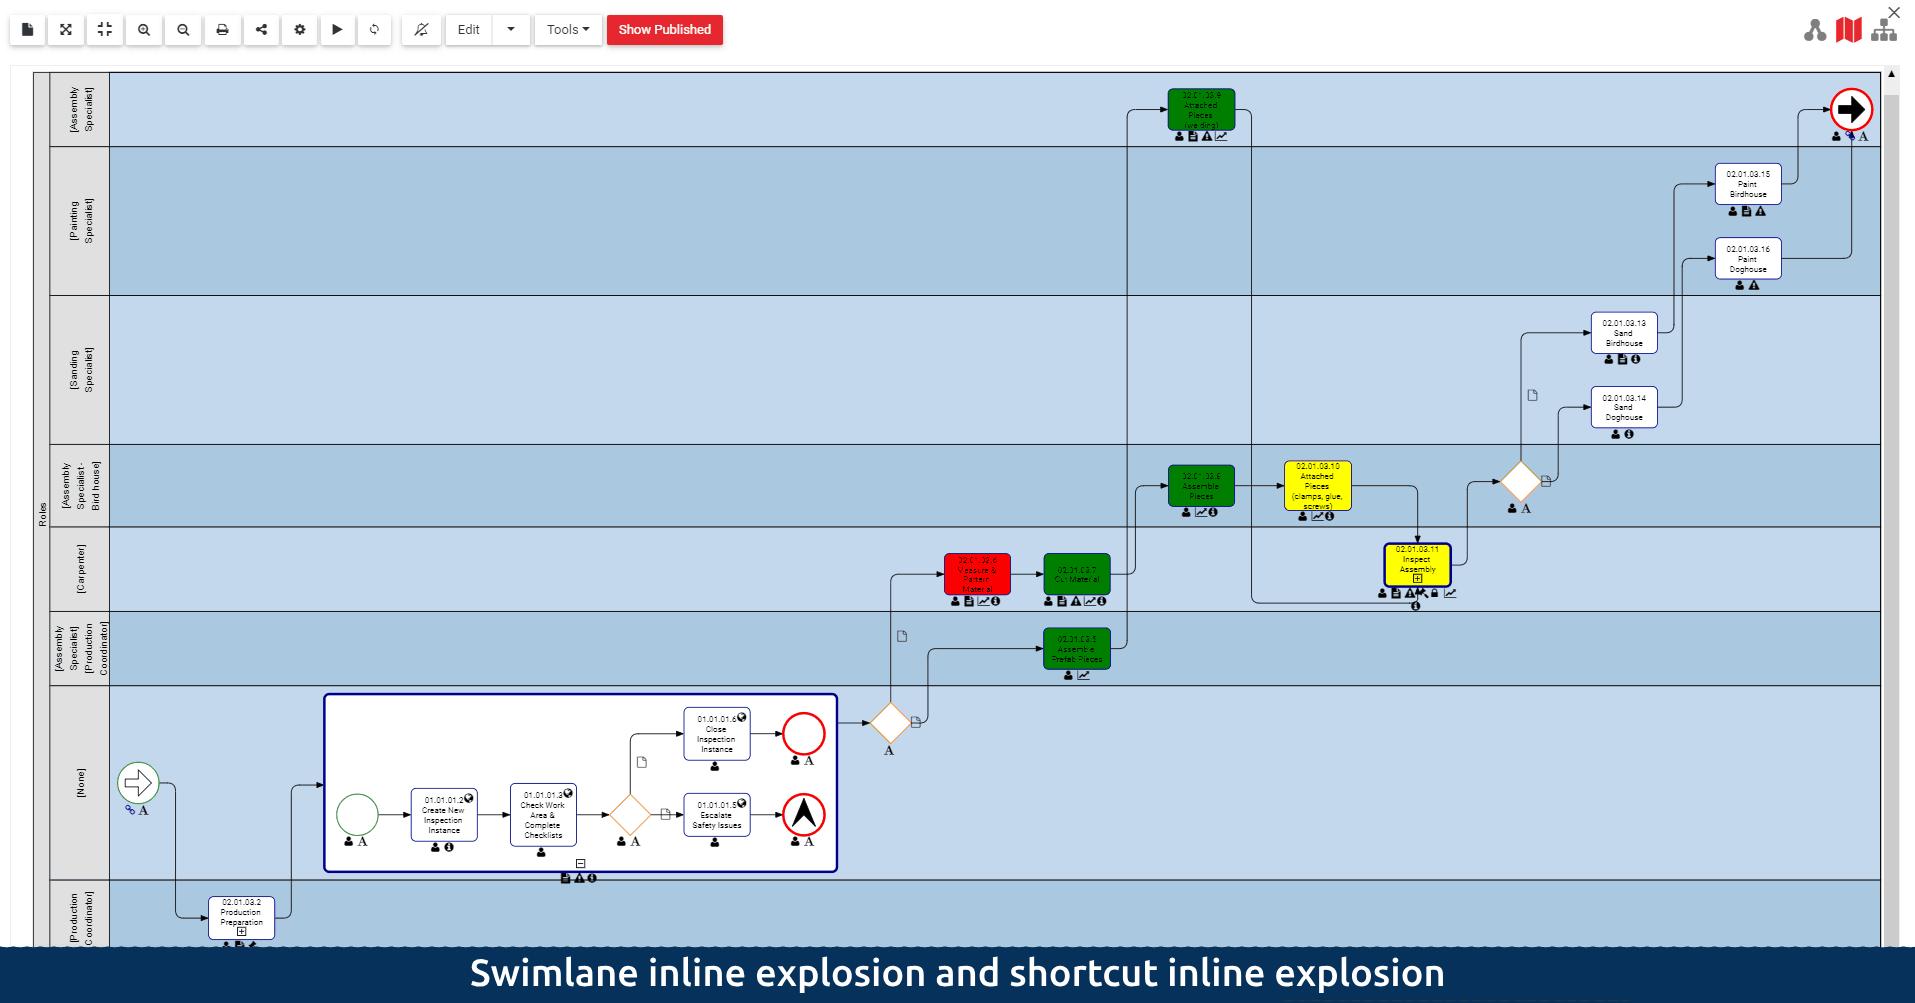 swimlane inline explosion and shortcut inline explosion